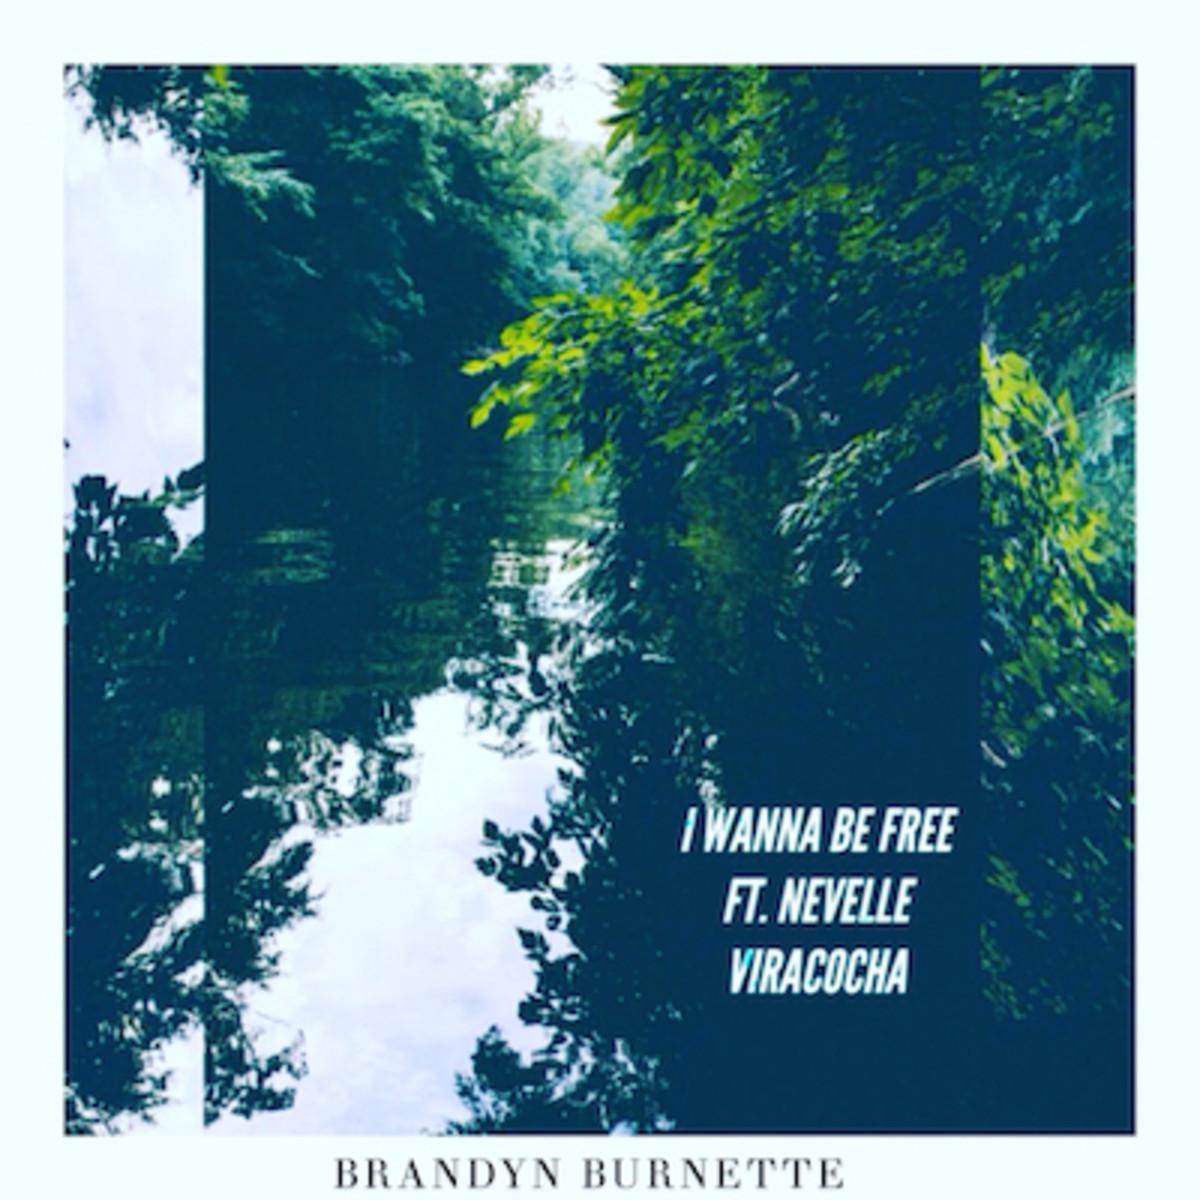 brandyn-burnette-i-wanna-be-free.jpg